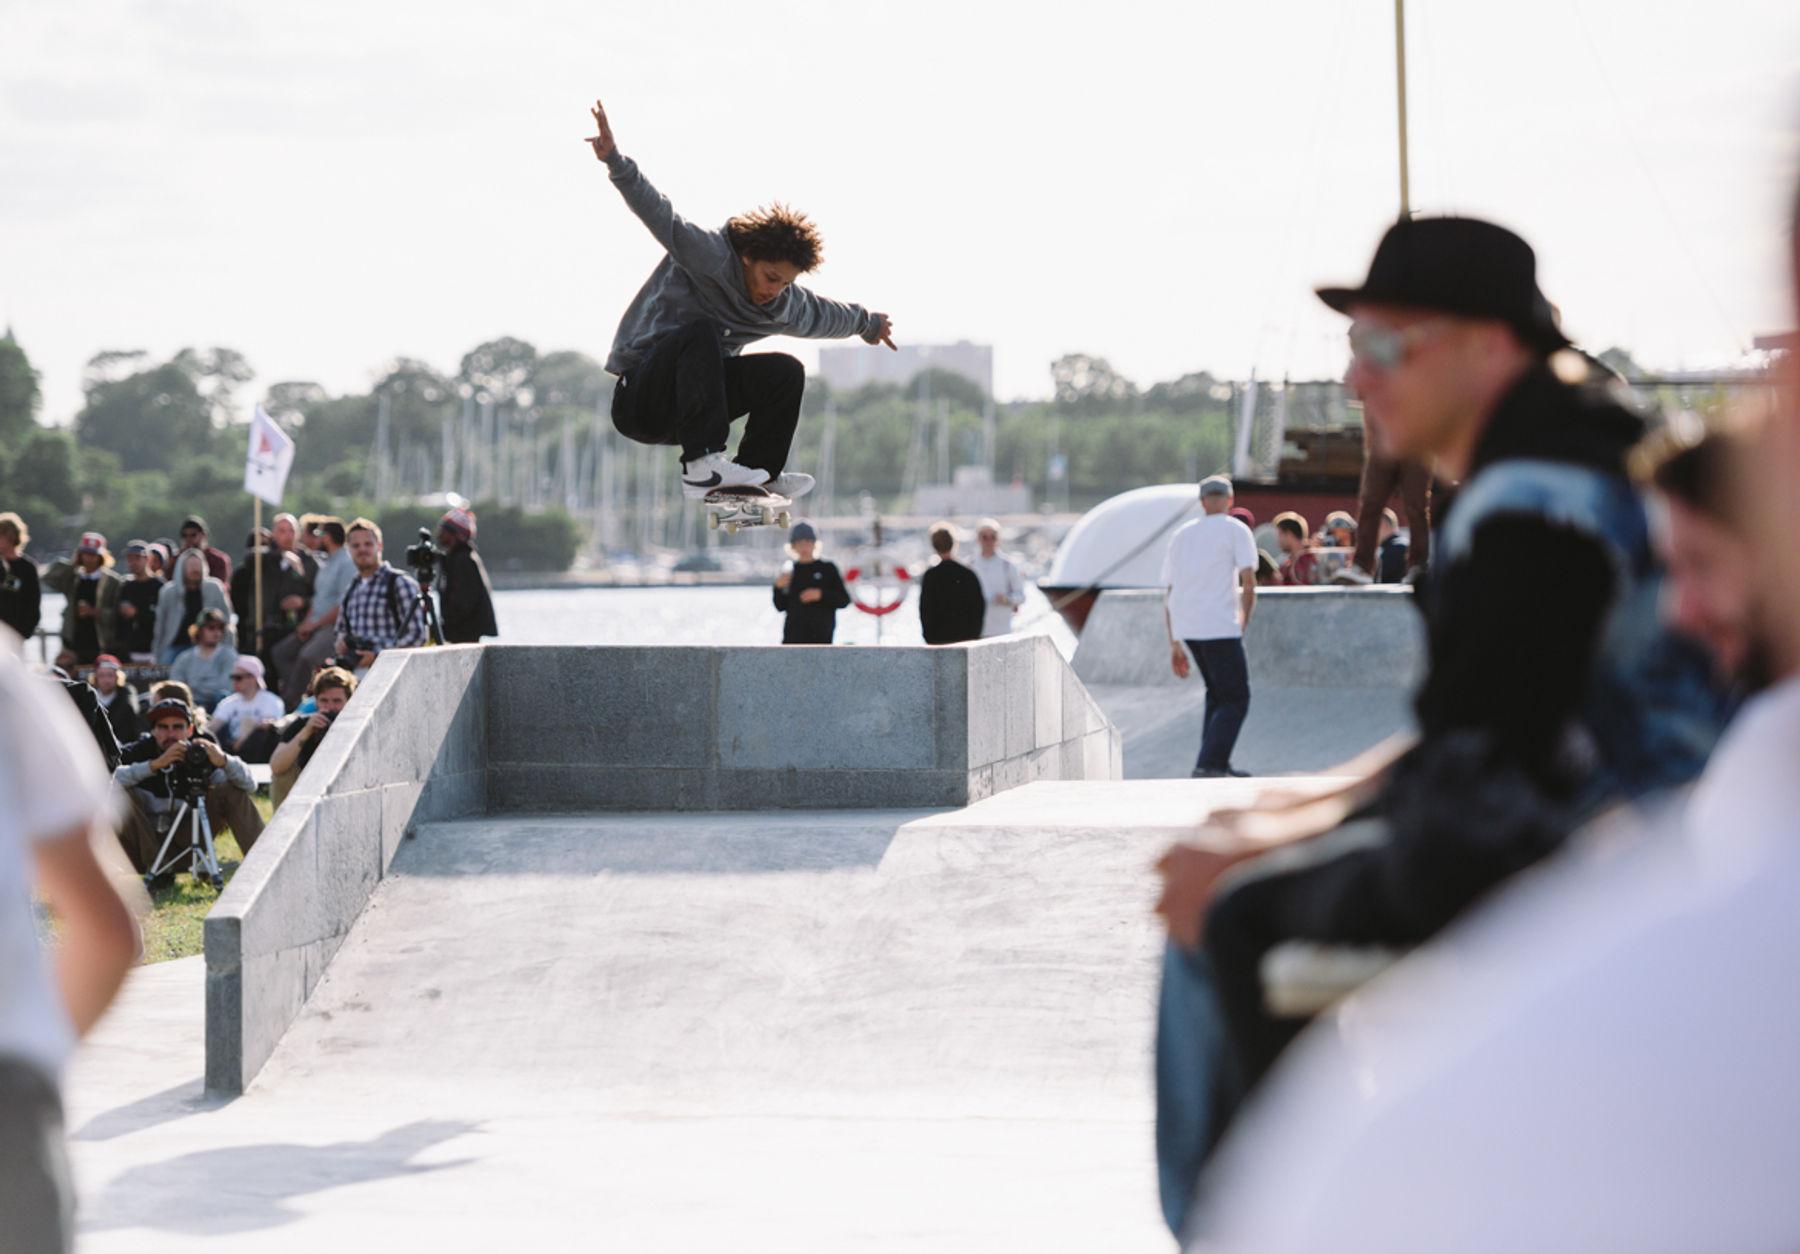 _IHC5862e-Kevin-Bradley-Wallie-Nike-SB-Copenhagen-Open-Day-4-July-2015-Photographer-Maksim-Kalanep